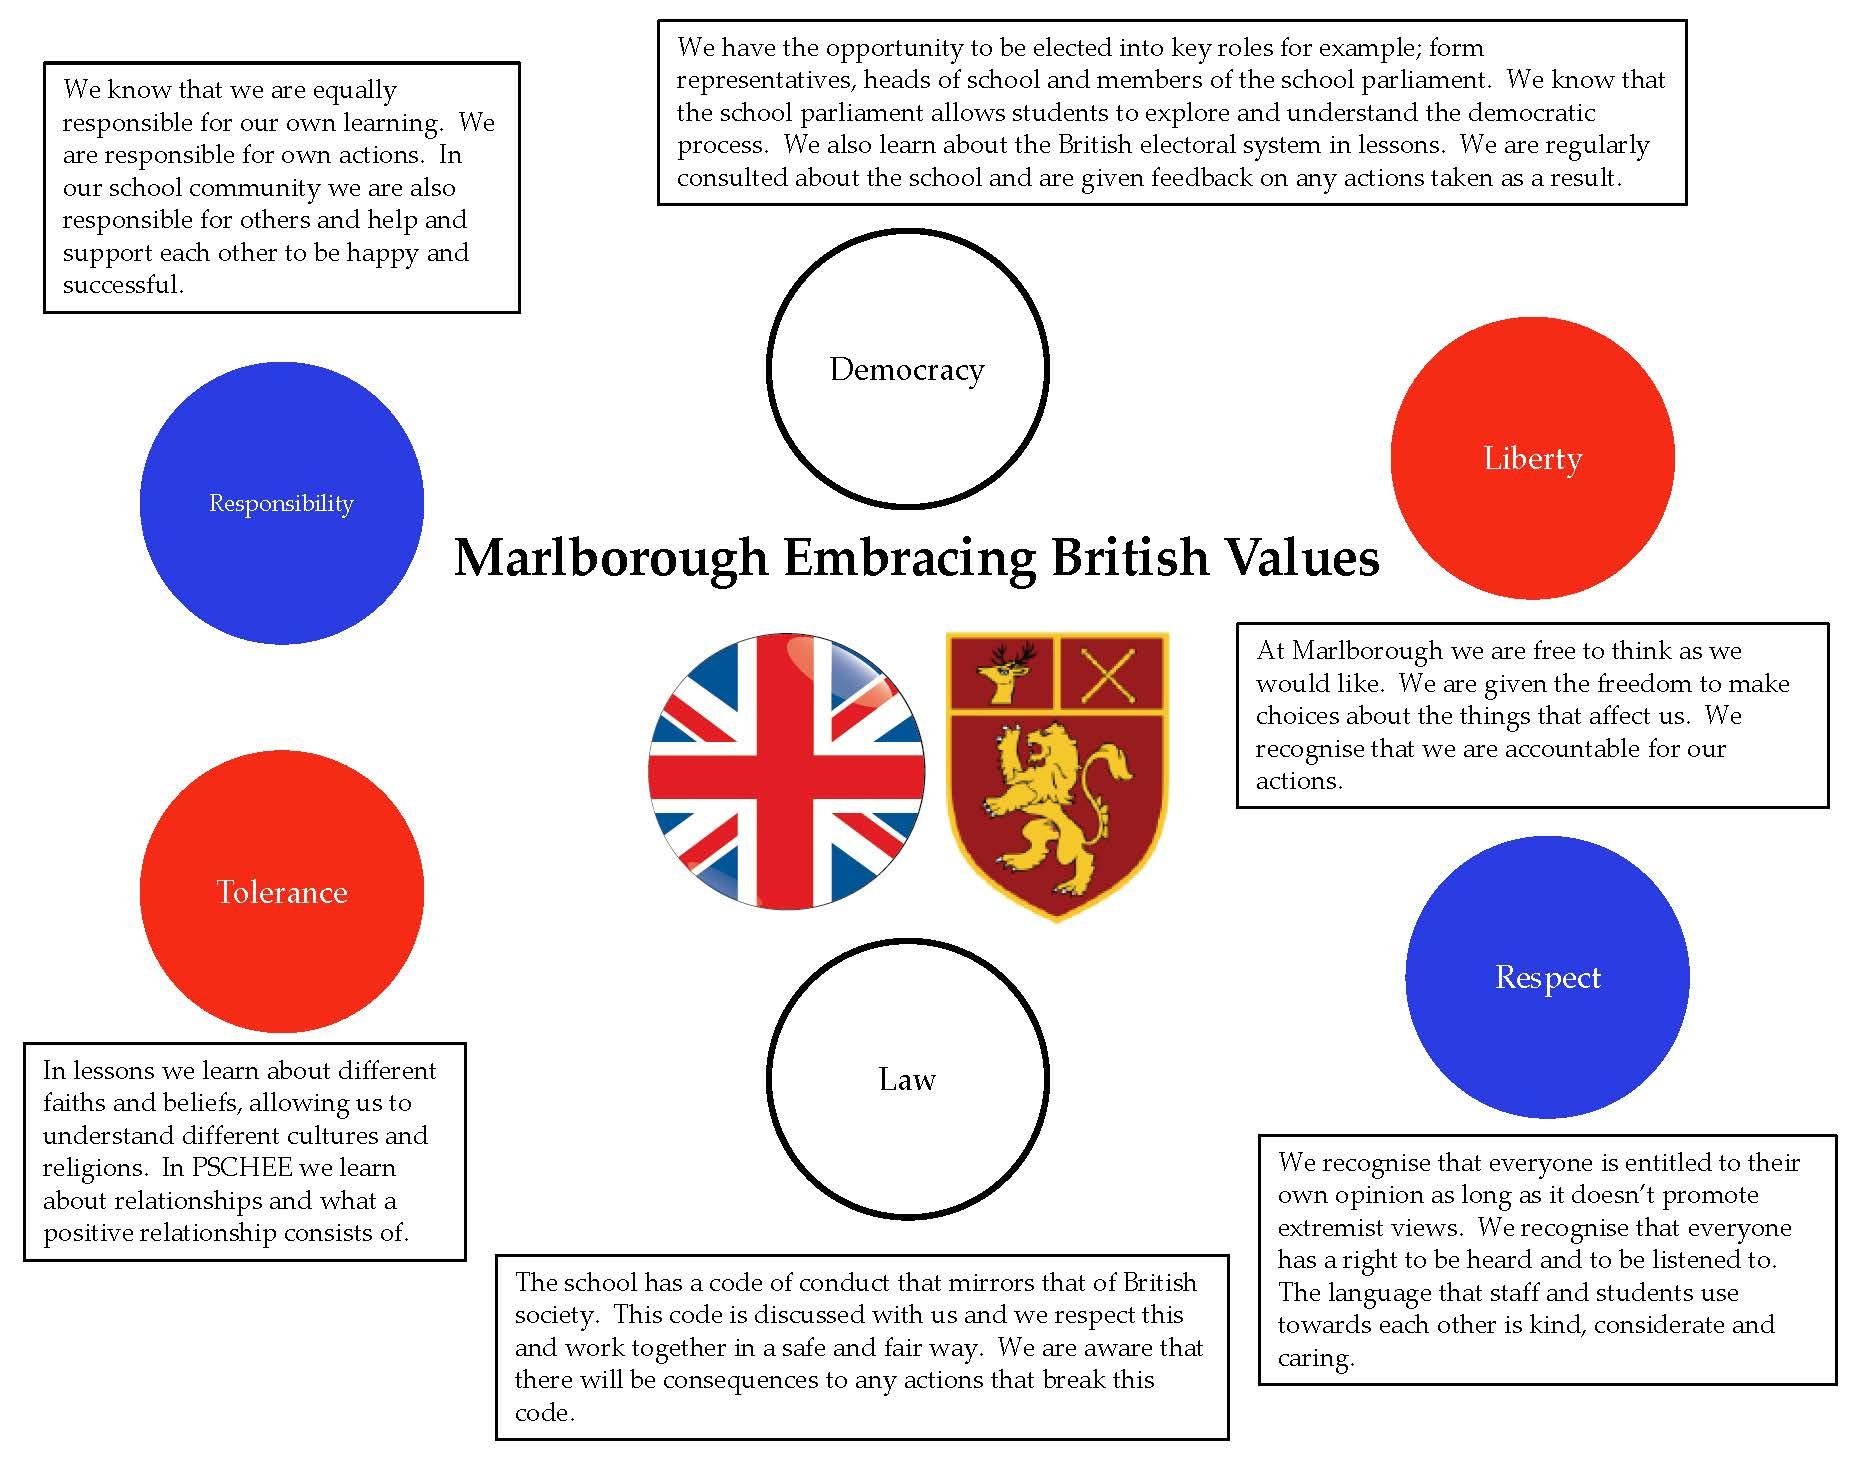 The Marlborough Science Academy